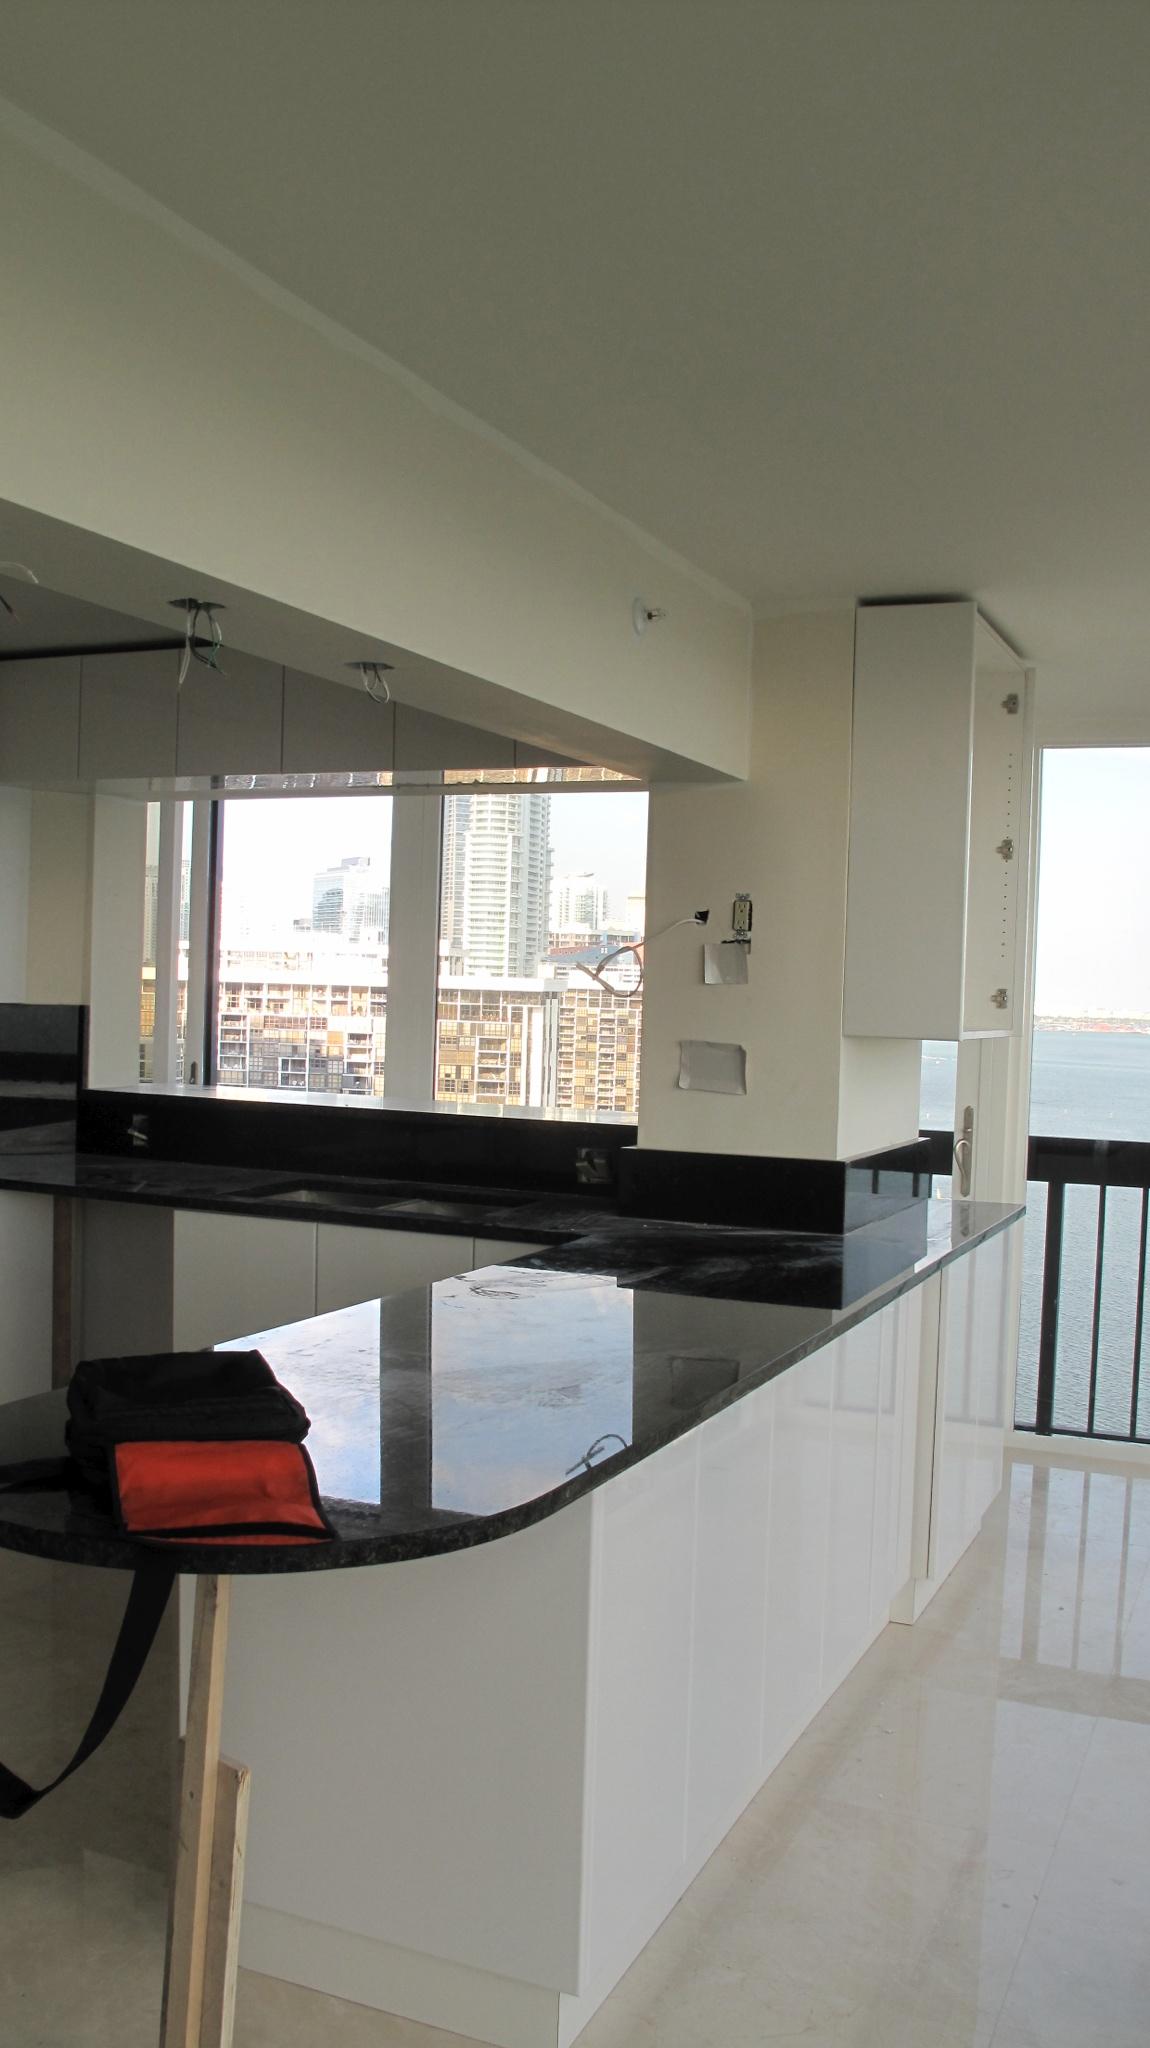 Kitchens-186.jpg